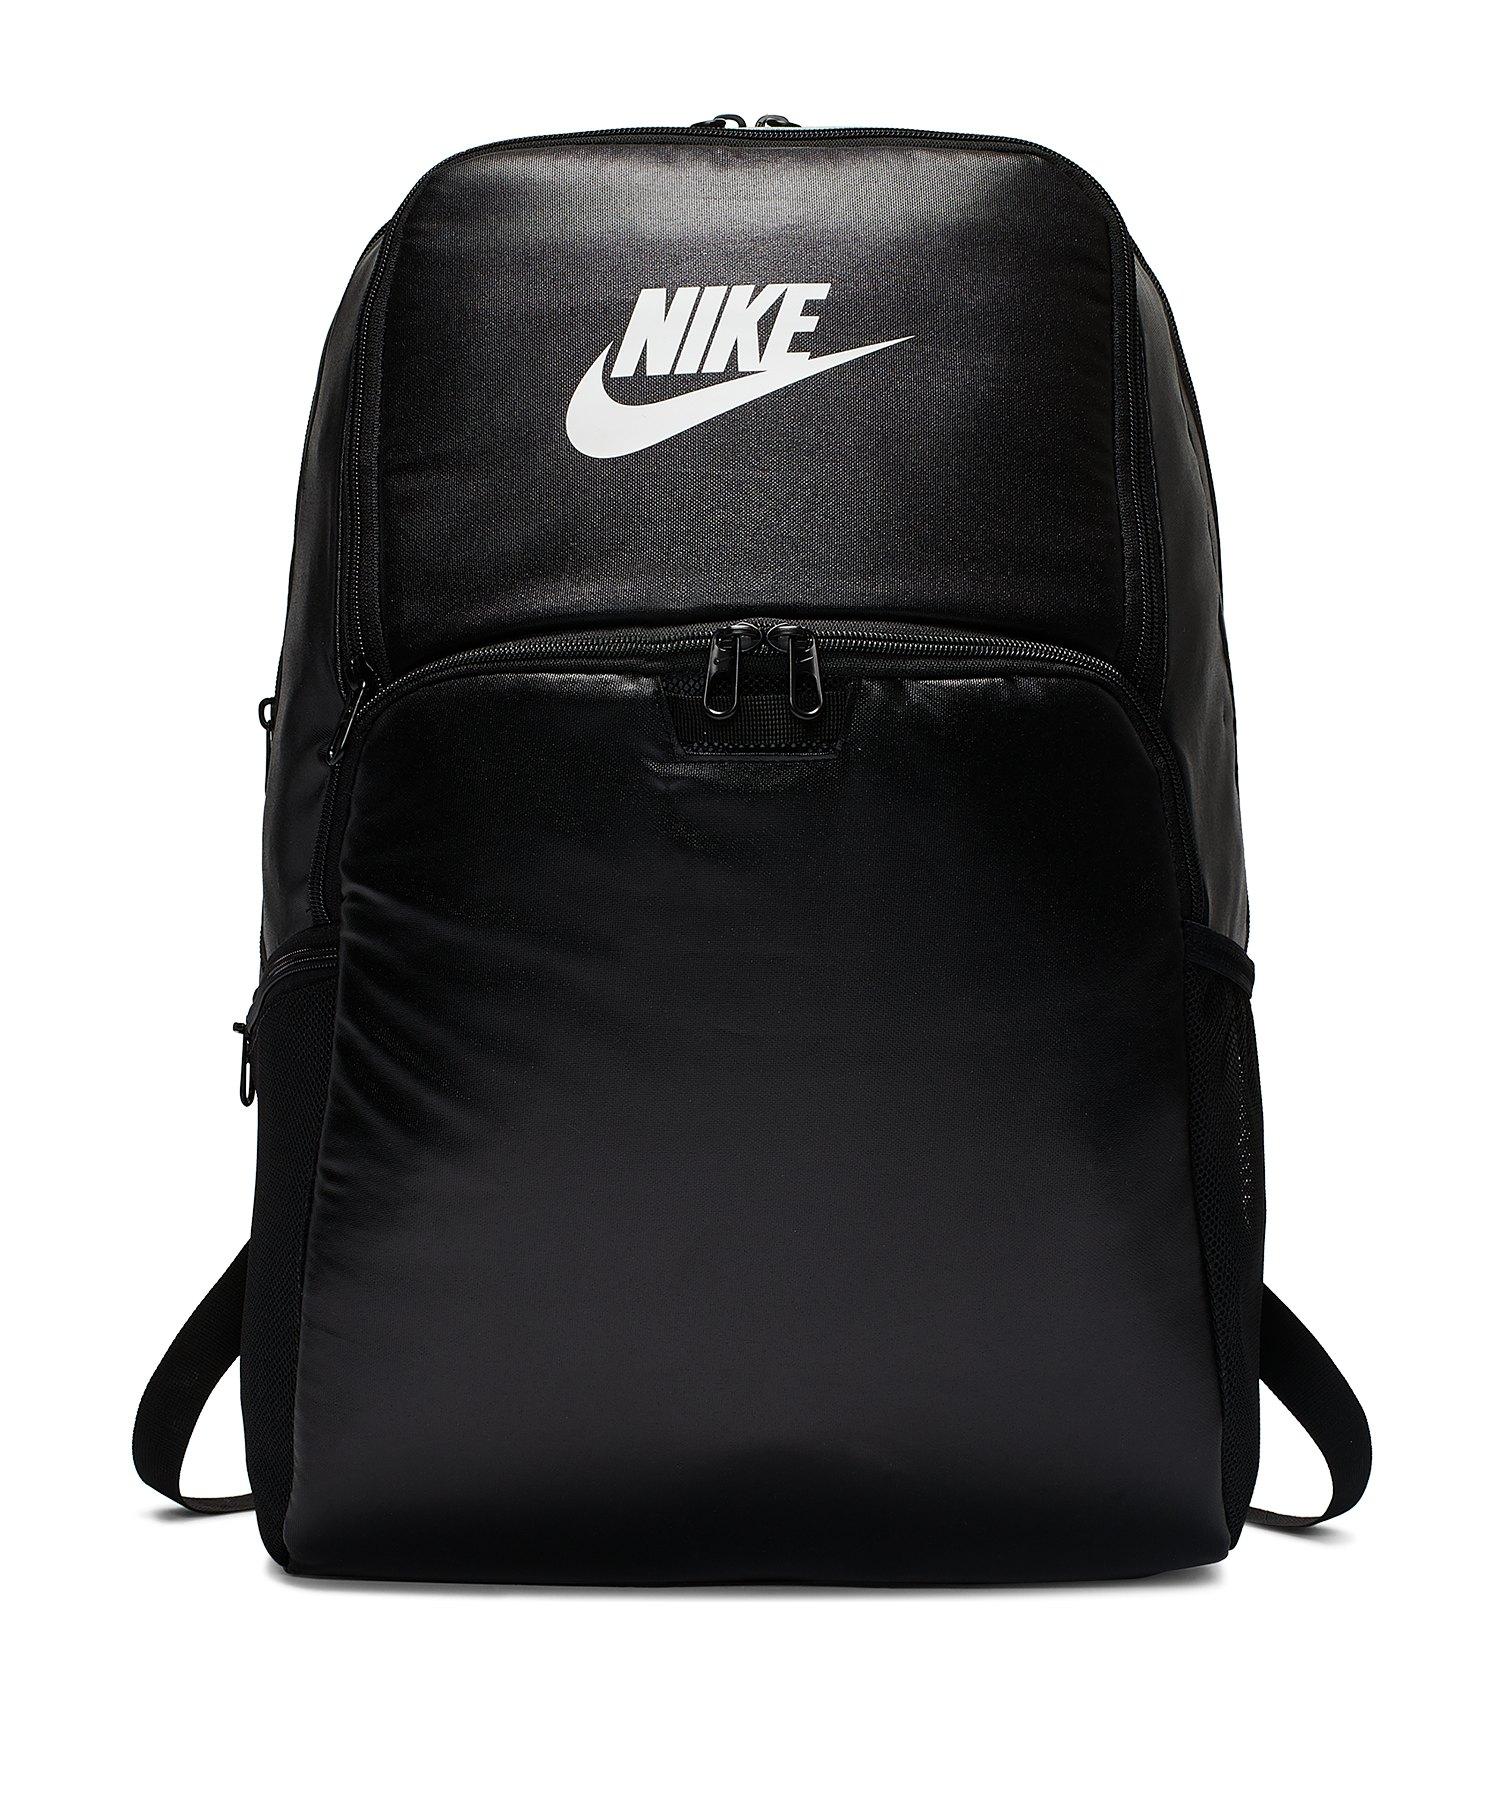 Nike Brasilia 9.0 Backpack Rucksack 30L F011 - schwarz